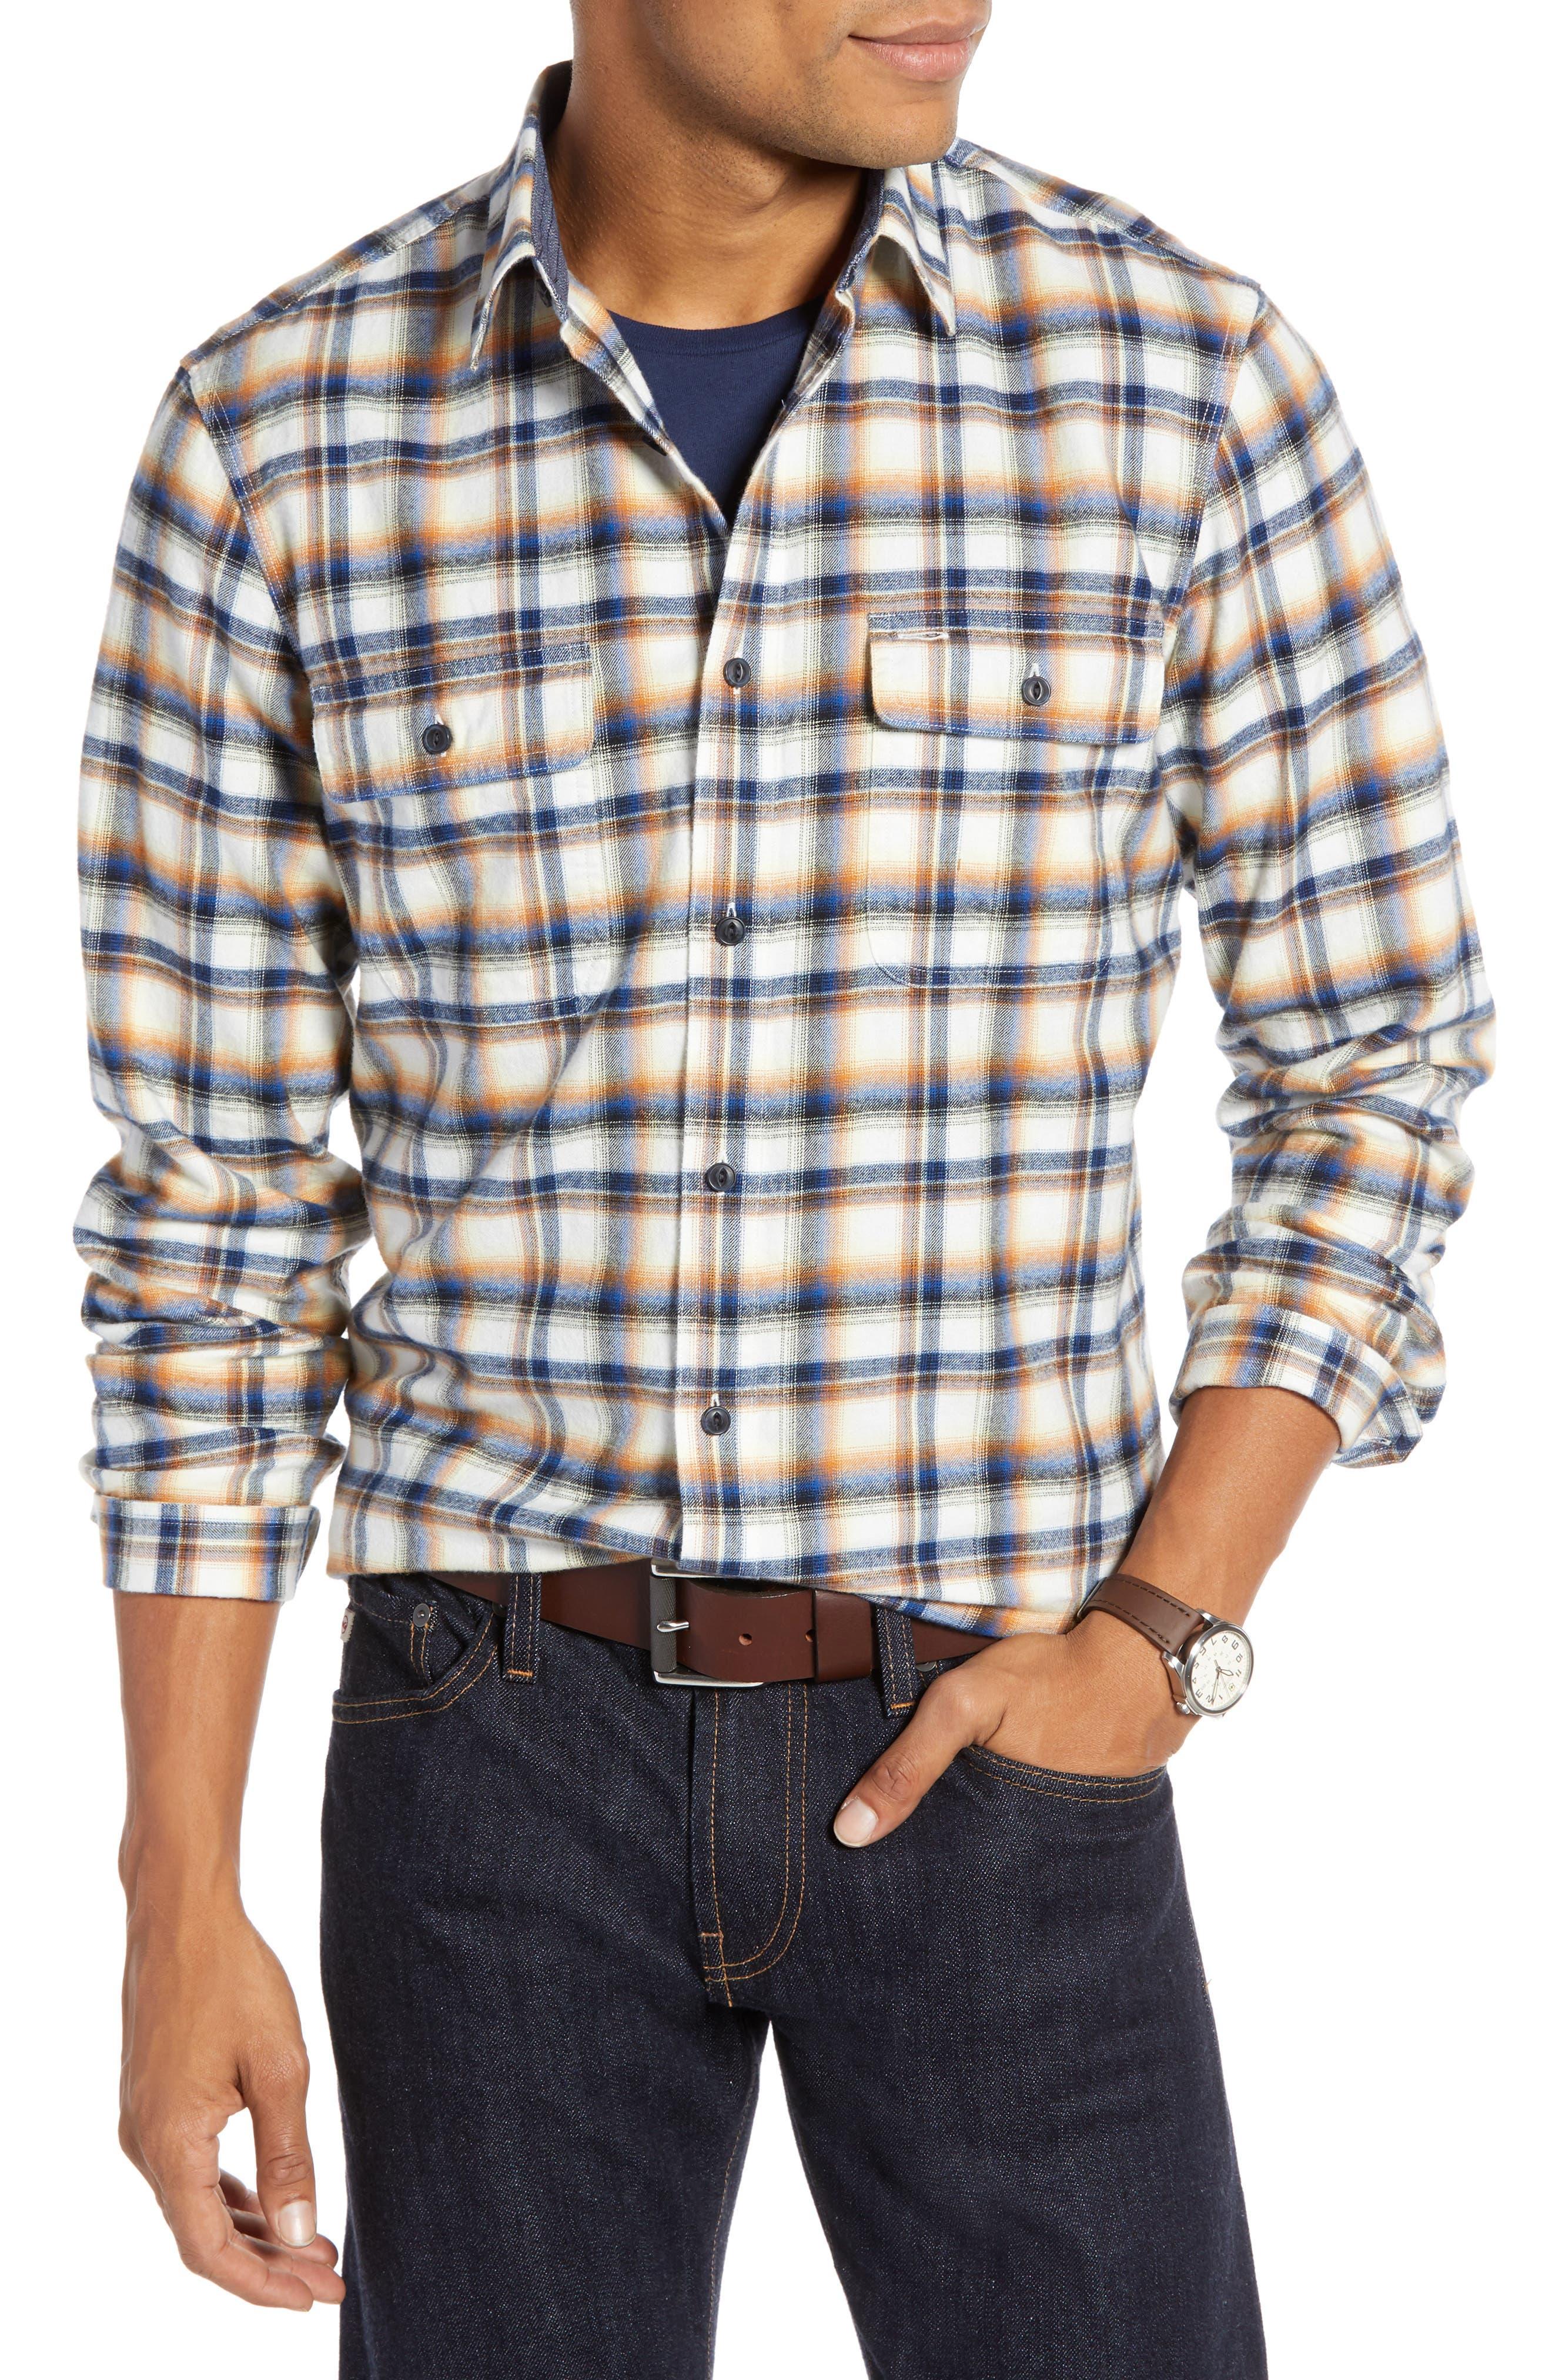 Trim Fit Trucker Plaid Sport Shirt,                             Main thumbnail 1, color,                             IVORY BLUE ORANGE PLAID